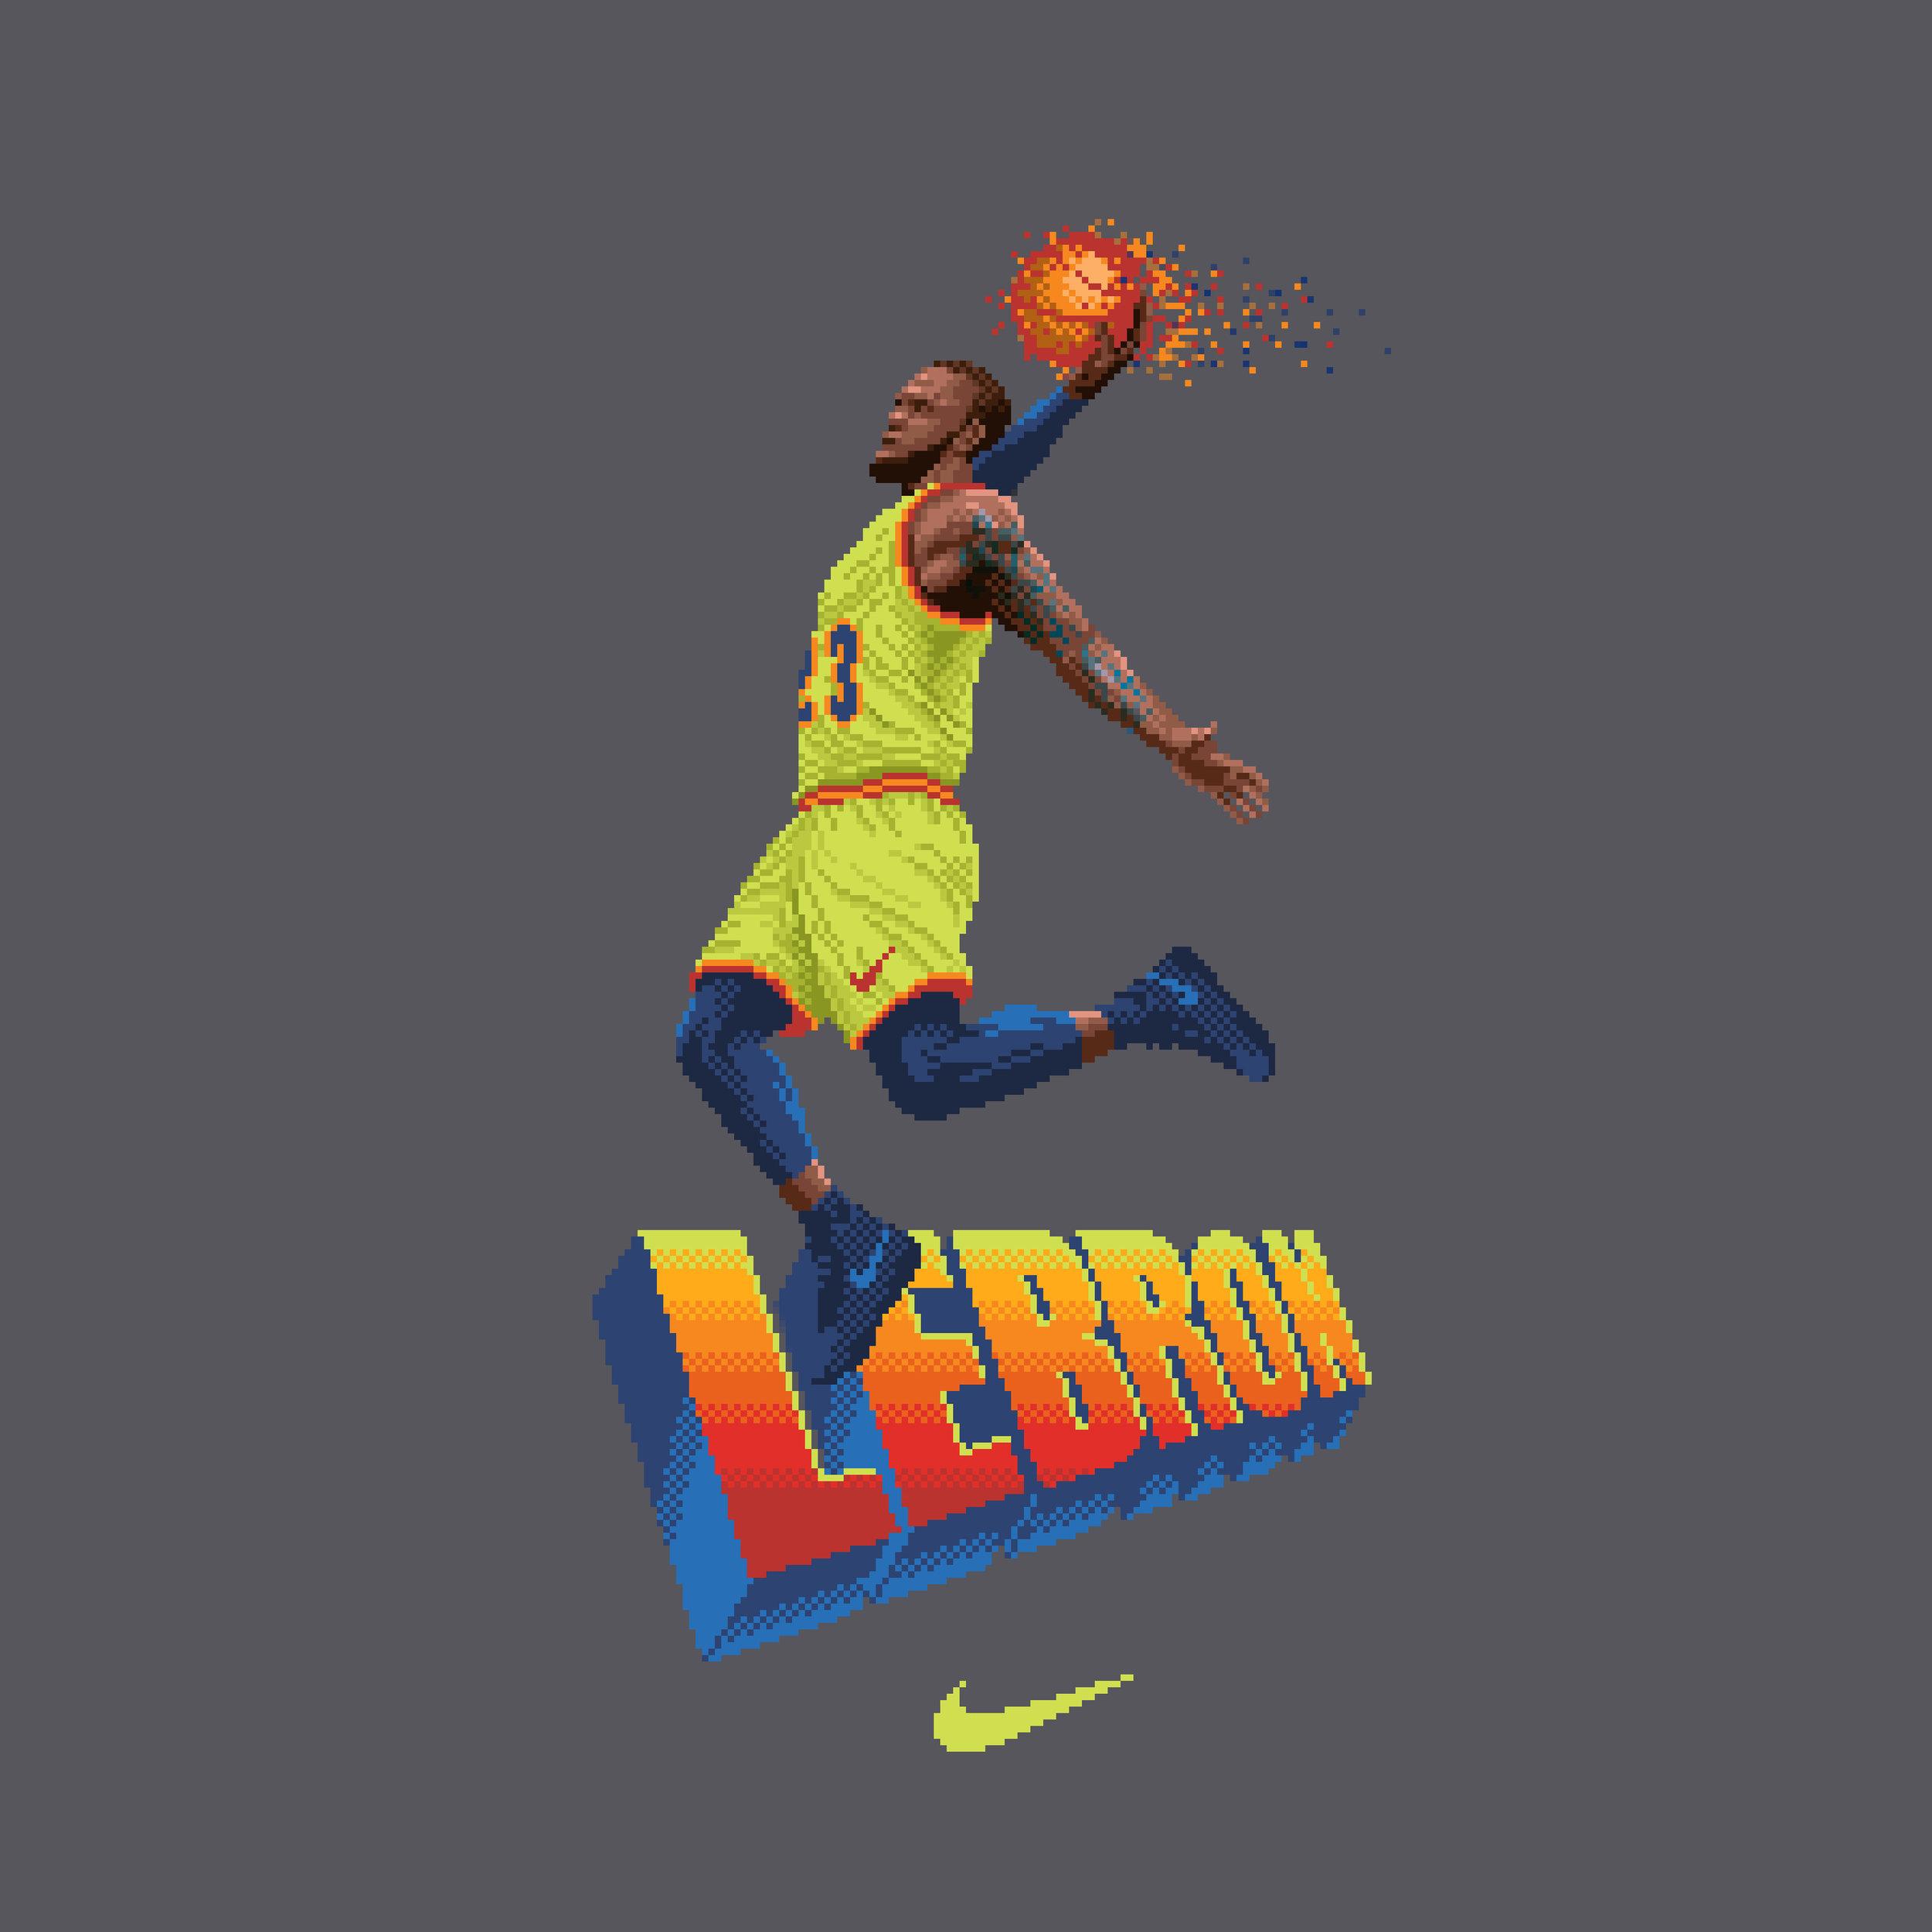 Lebron t-shirt design for Nike (2018)